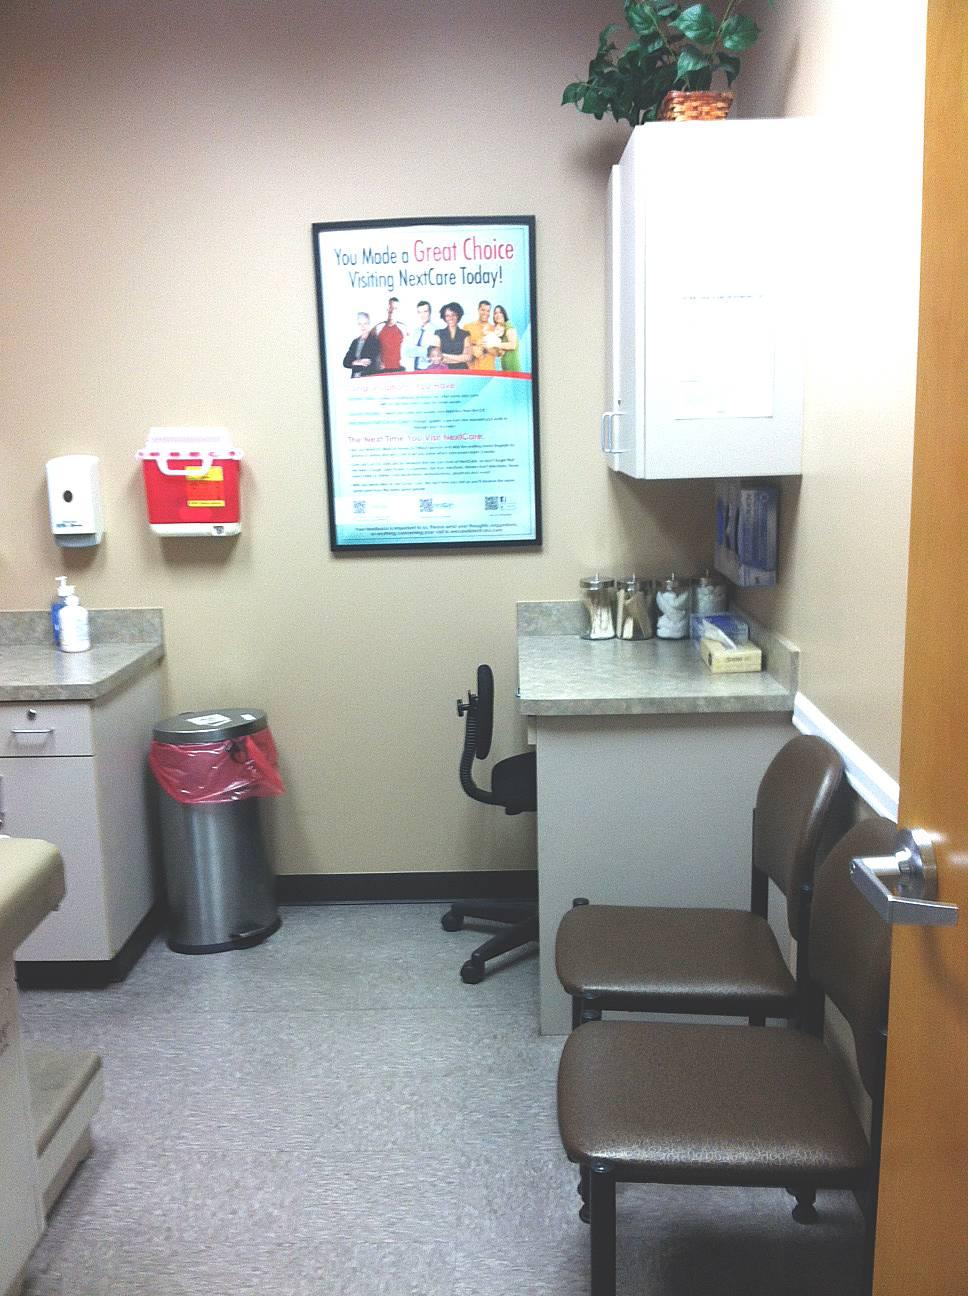 NextCare Urgent Care - hospital    Photo 6 of 7   Address: 1066 N Power Rd #101, Mesa, AZ 85205, USA   Phone: (480) 807-0130